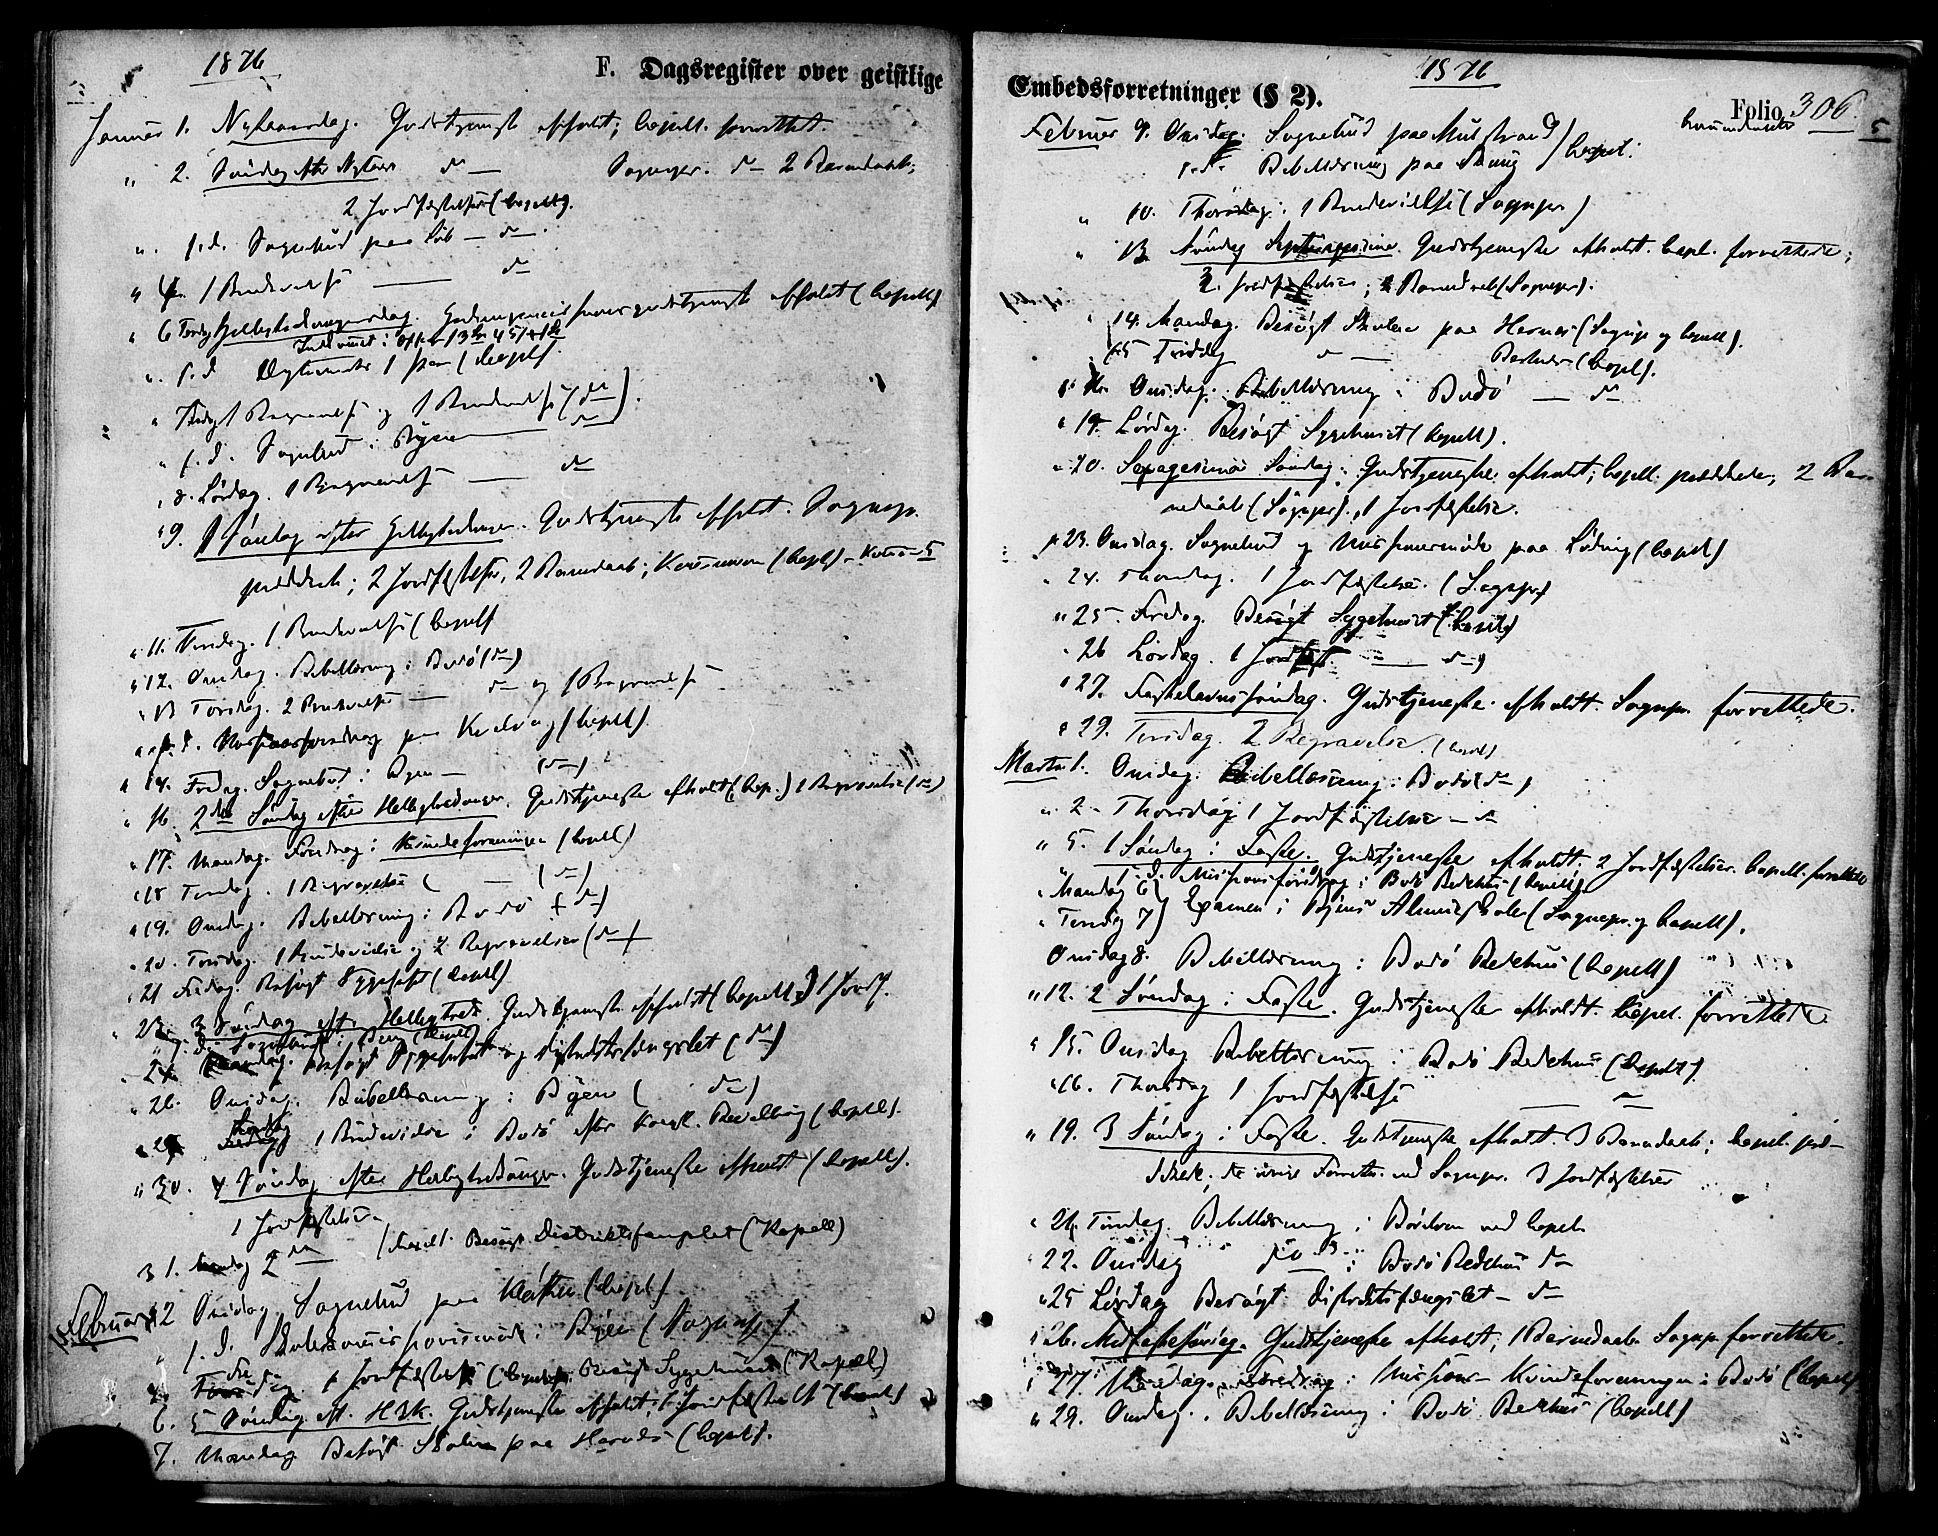 SAT, Ministerialprotokoller, klokkerbøker og fødselsregistre - Nordland, 801/L0009: Ministerialbok nr. 801A09, 1876-1883, s. 306